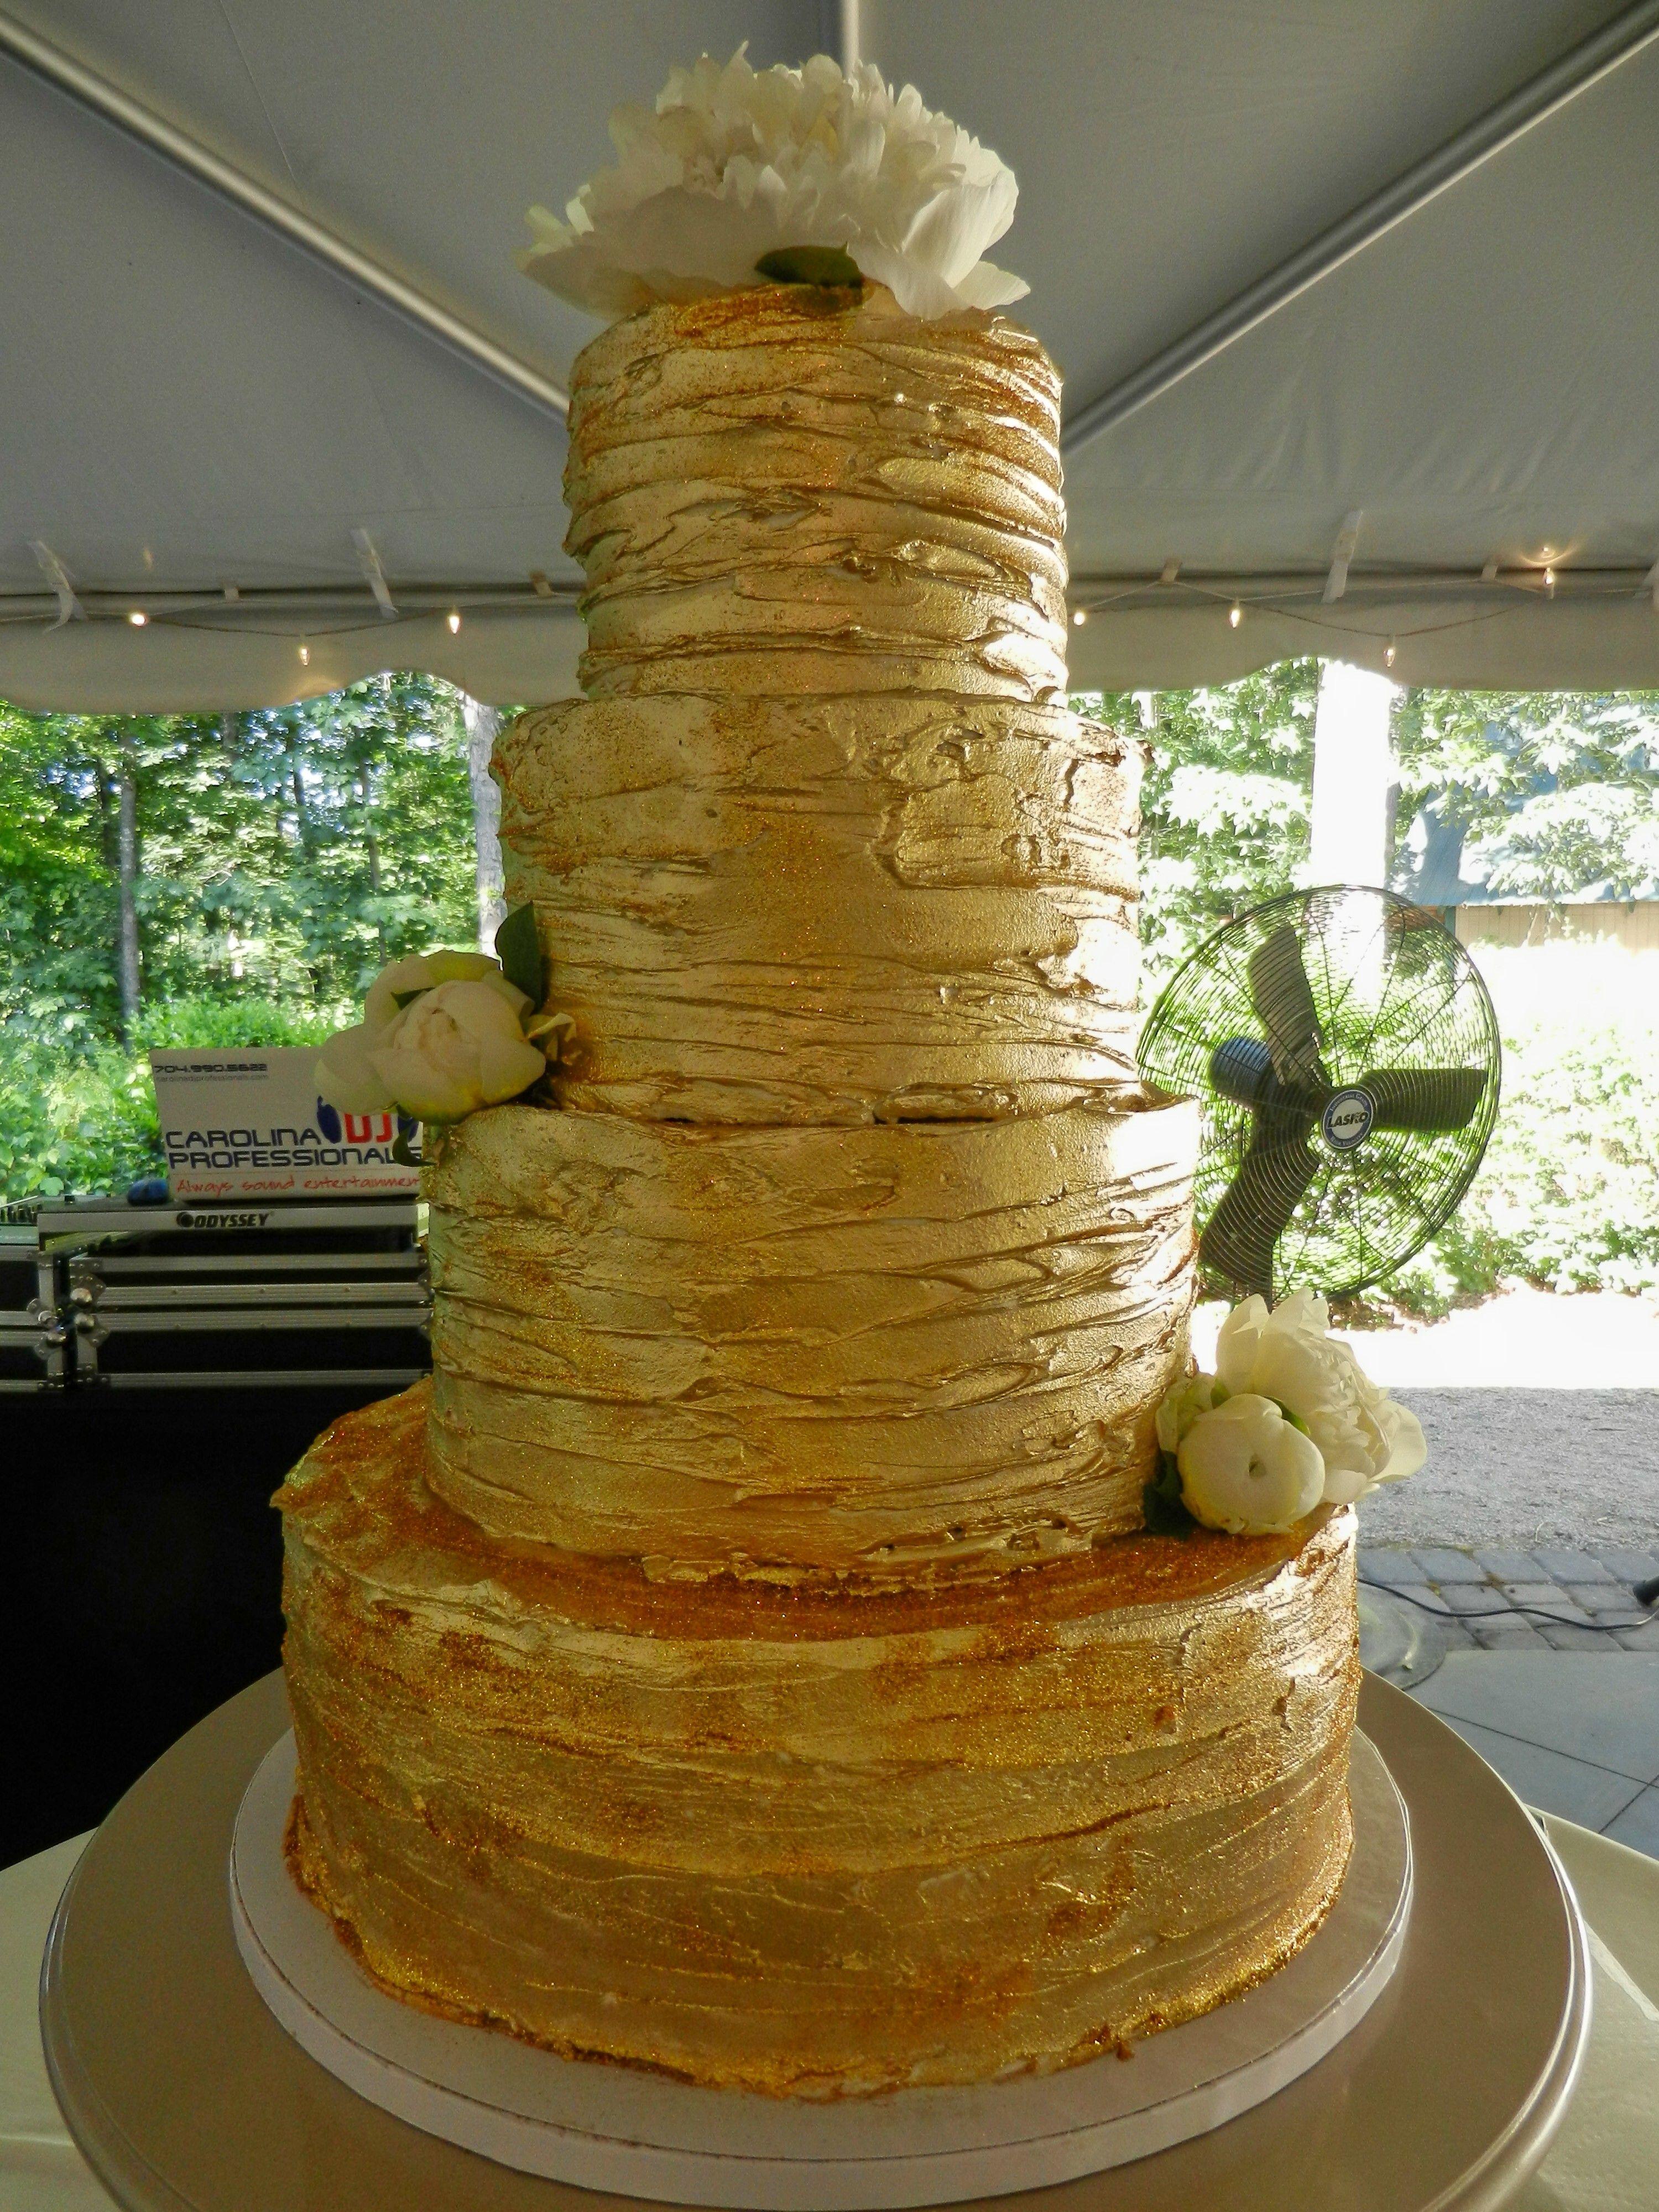 gold glitter wedding cake www,cheesecakeetc.biz wedding cakes ...